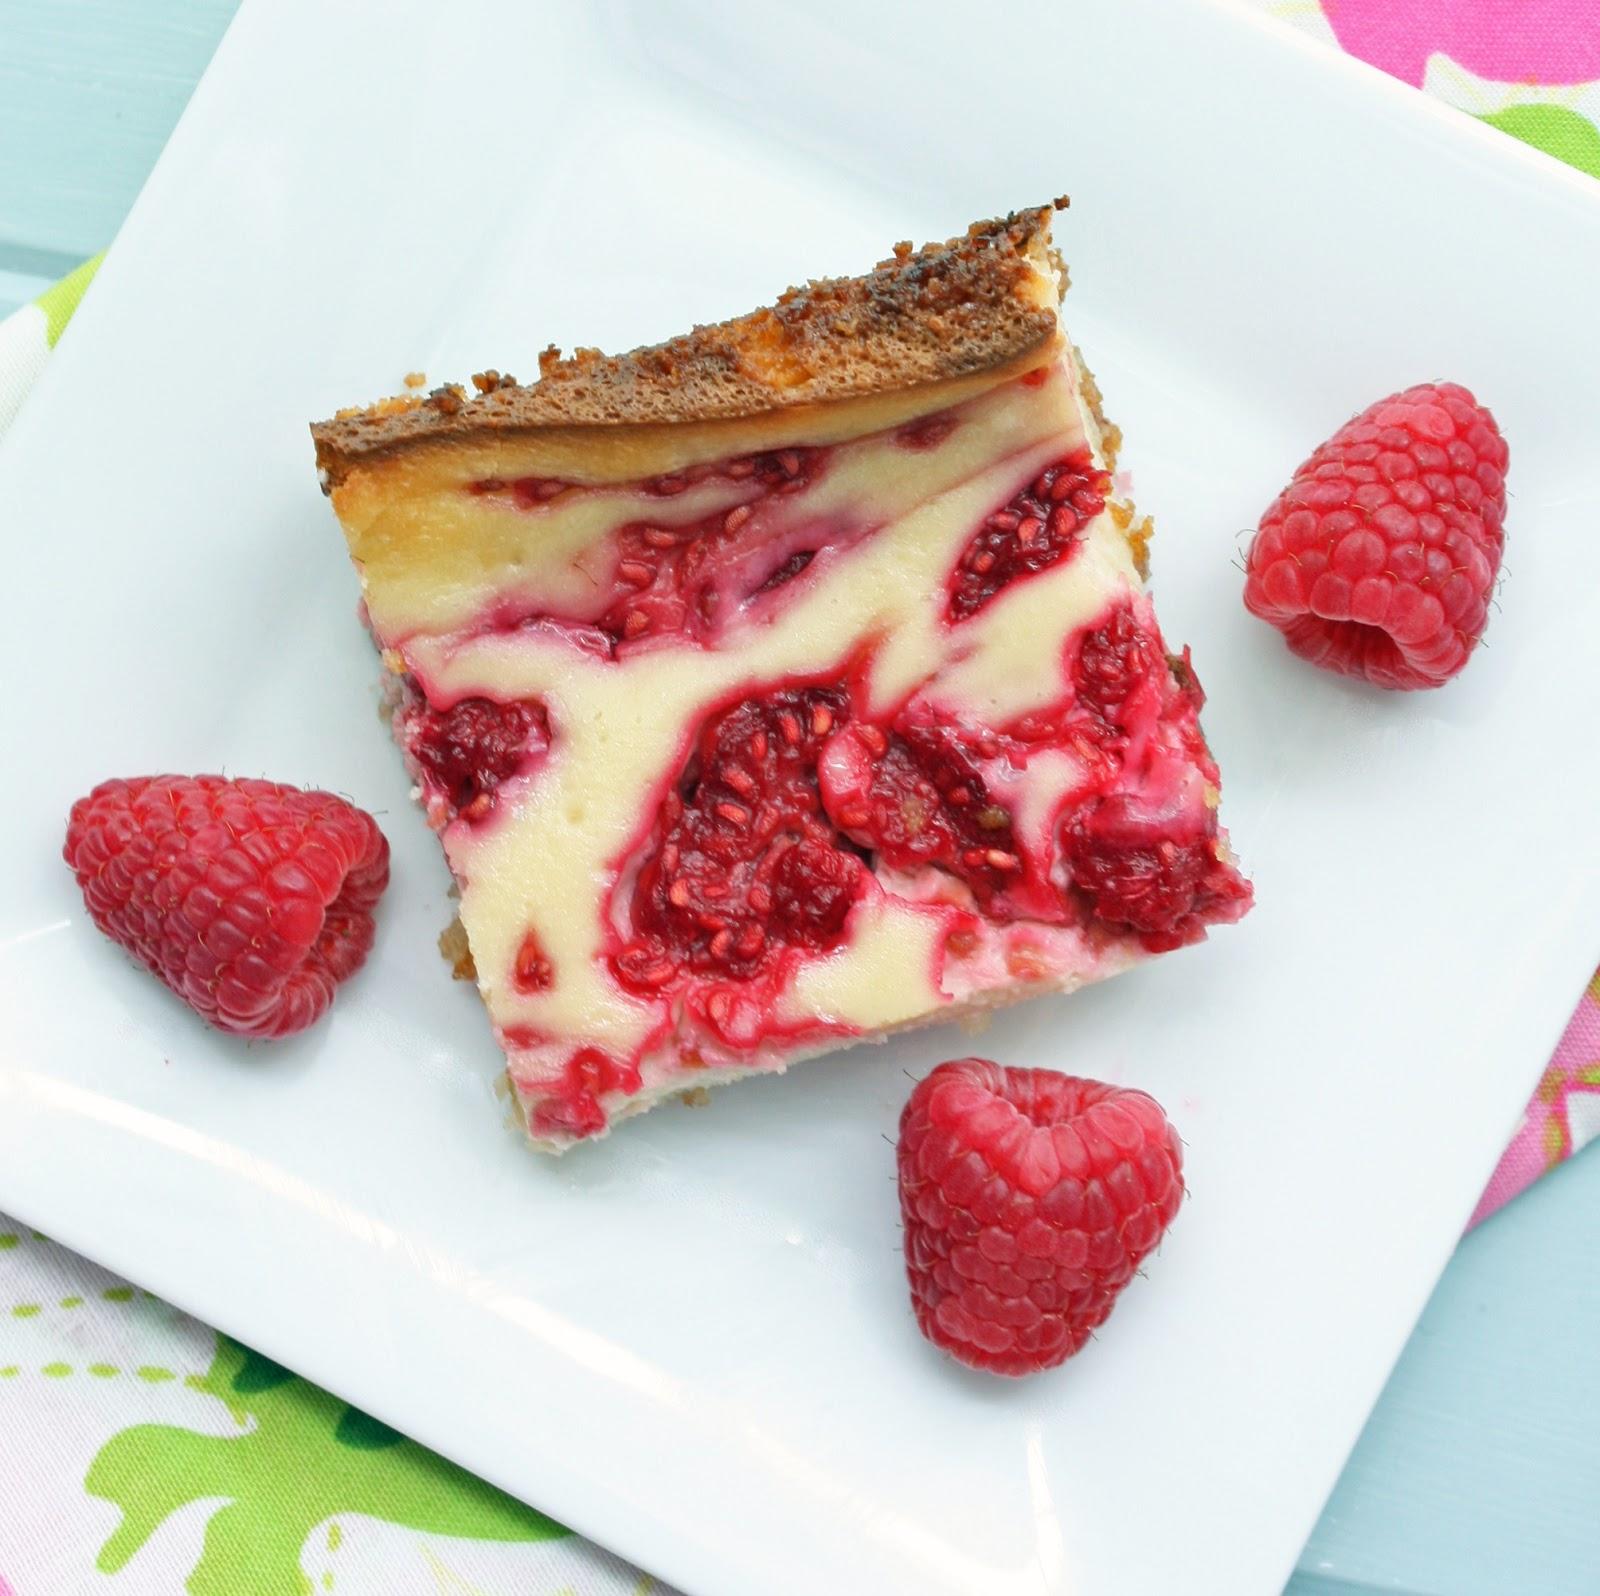 Low Carb Raspberry Cheesecake Bars | I Breathe I'm Hungry